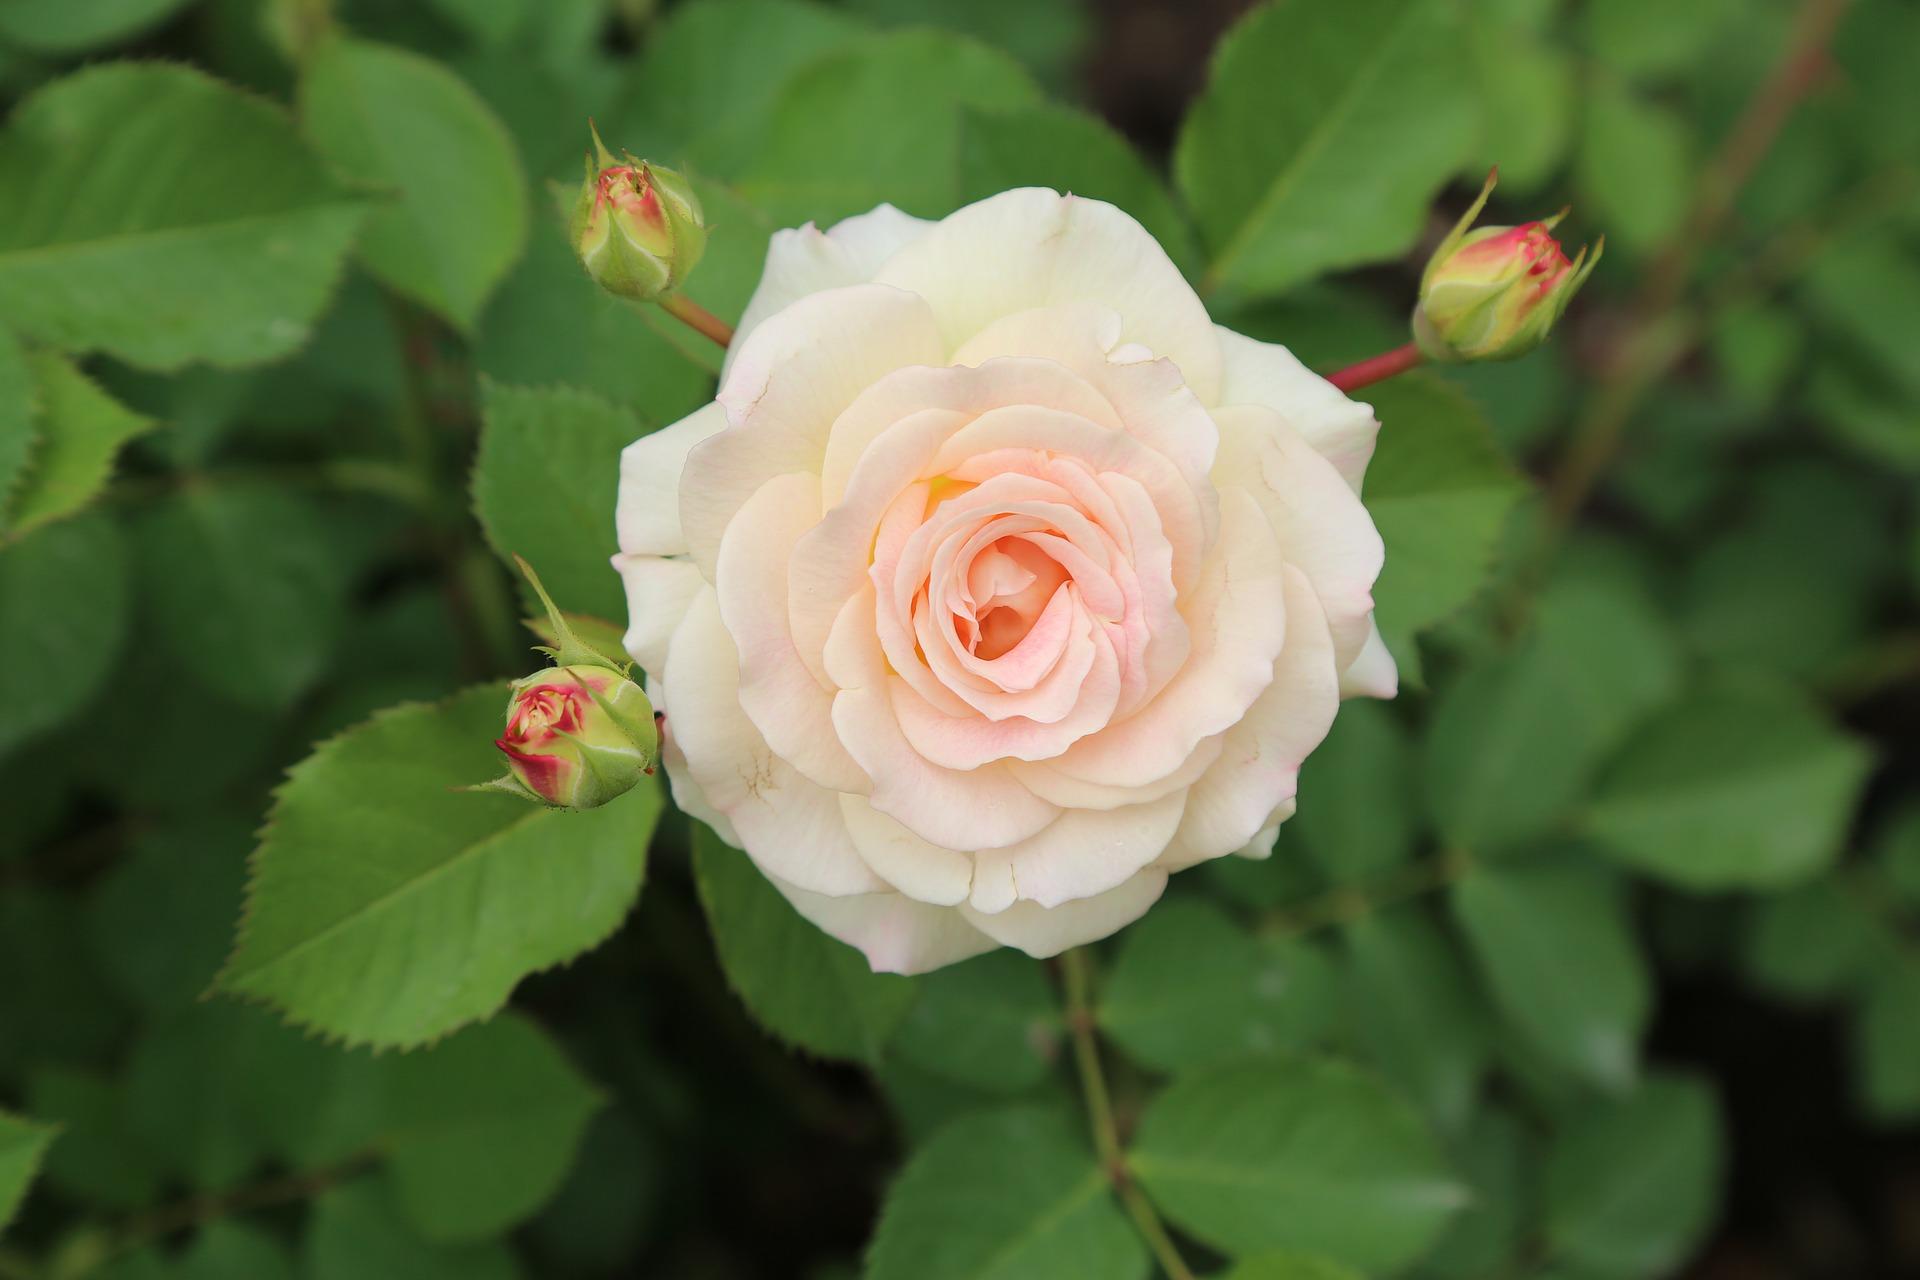 rose-3384487_1920.jpg